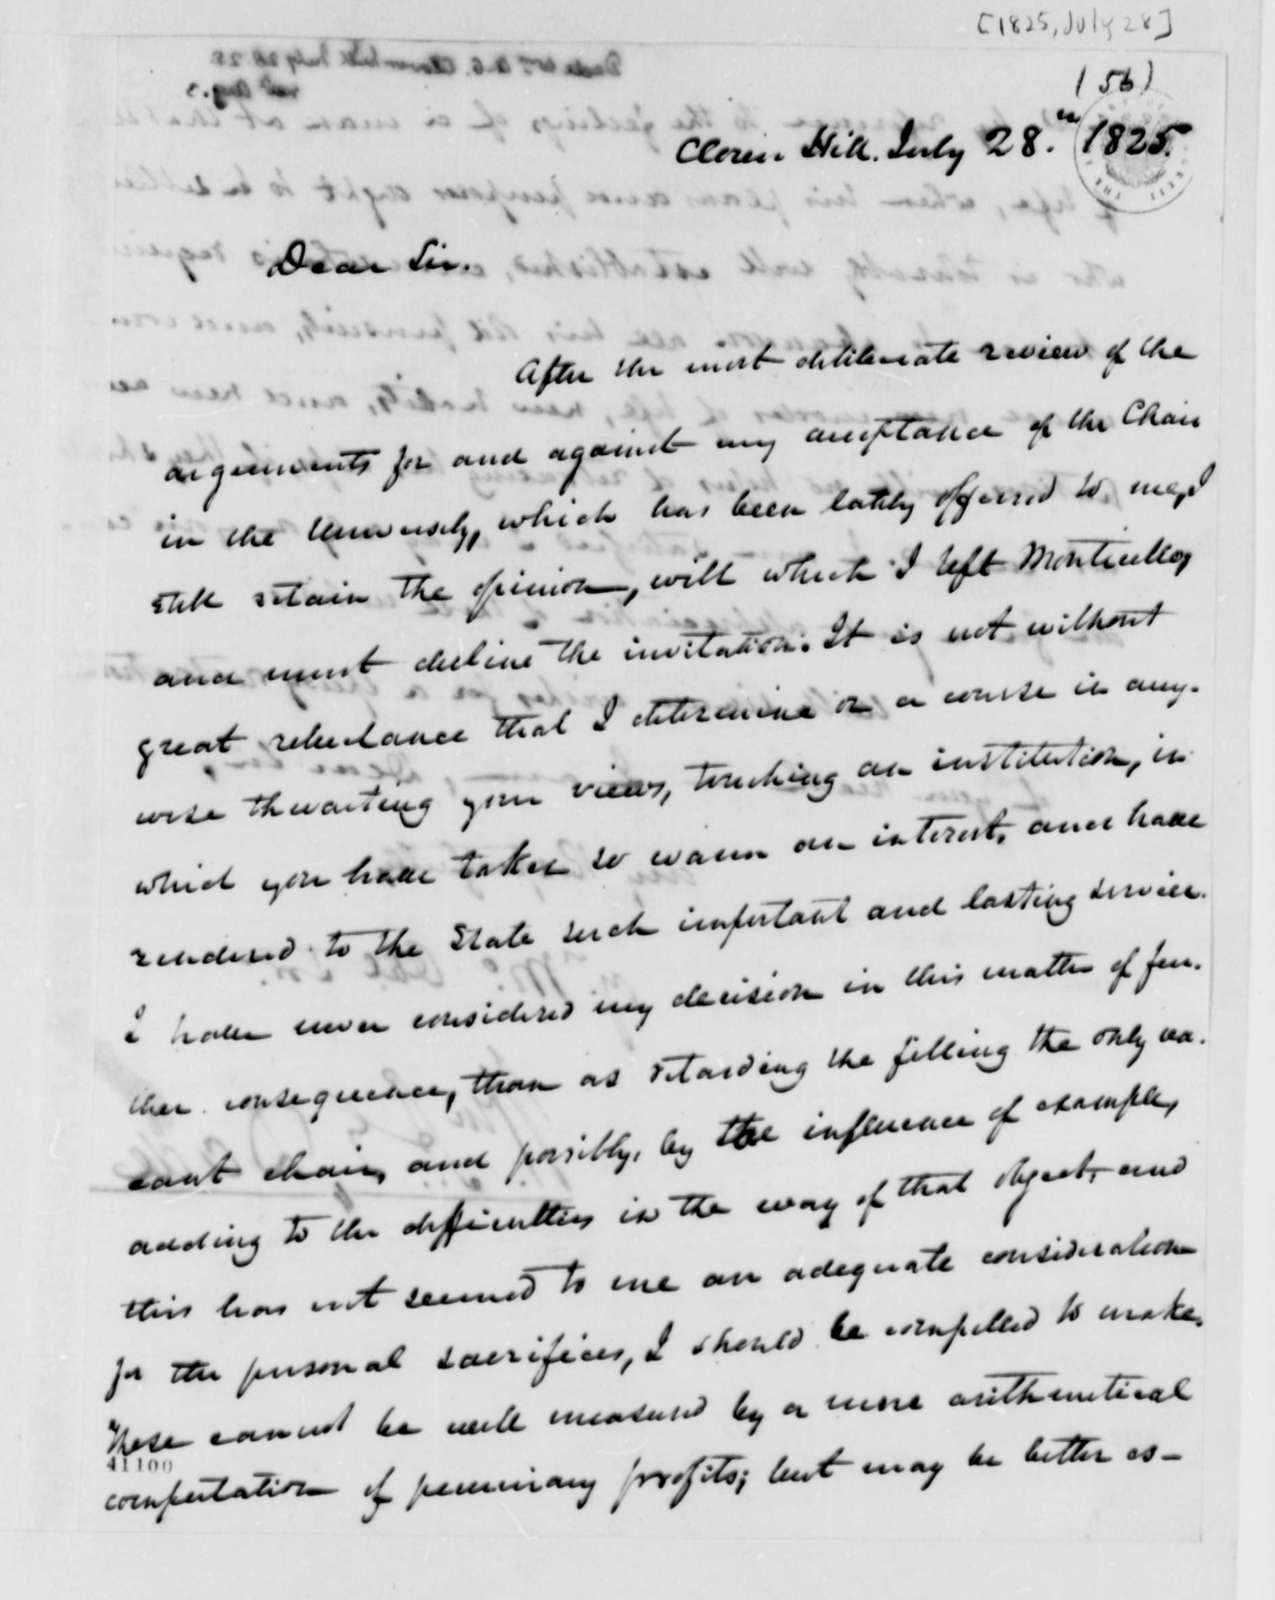 William A. G. Dade to Thomas Jefferson, July 28, 1825